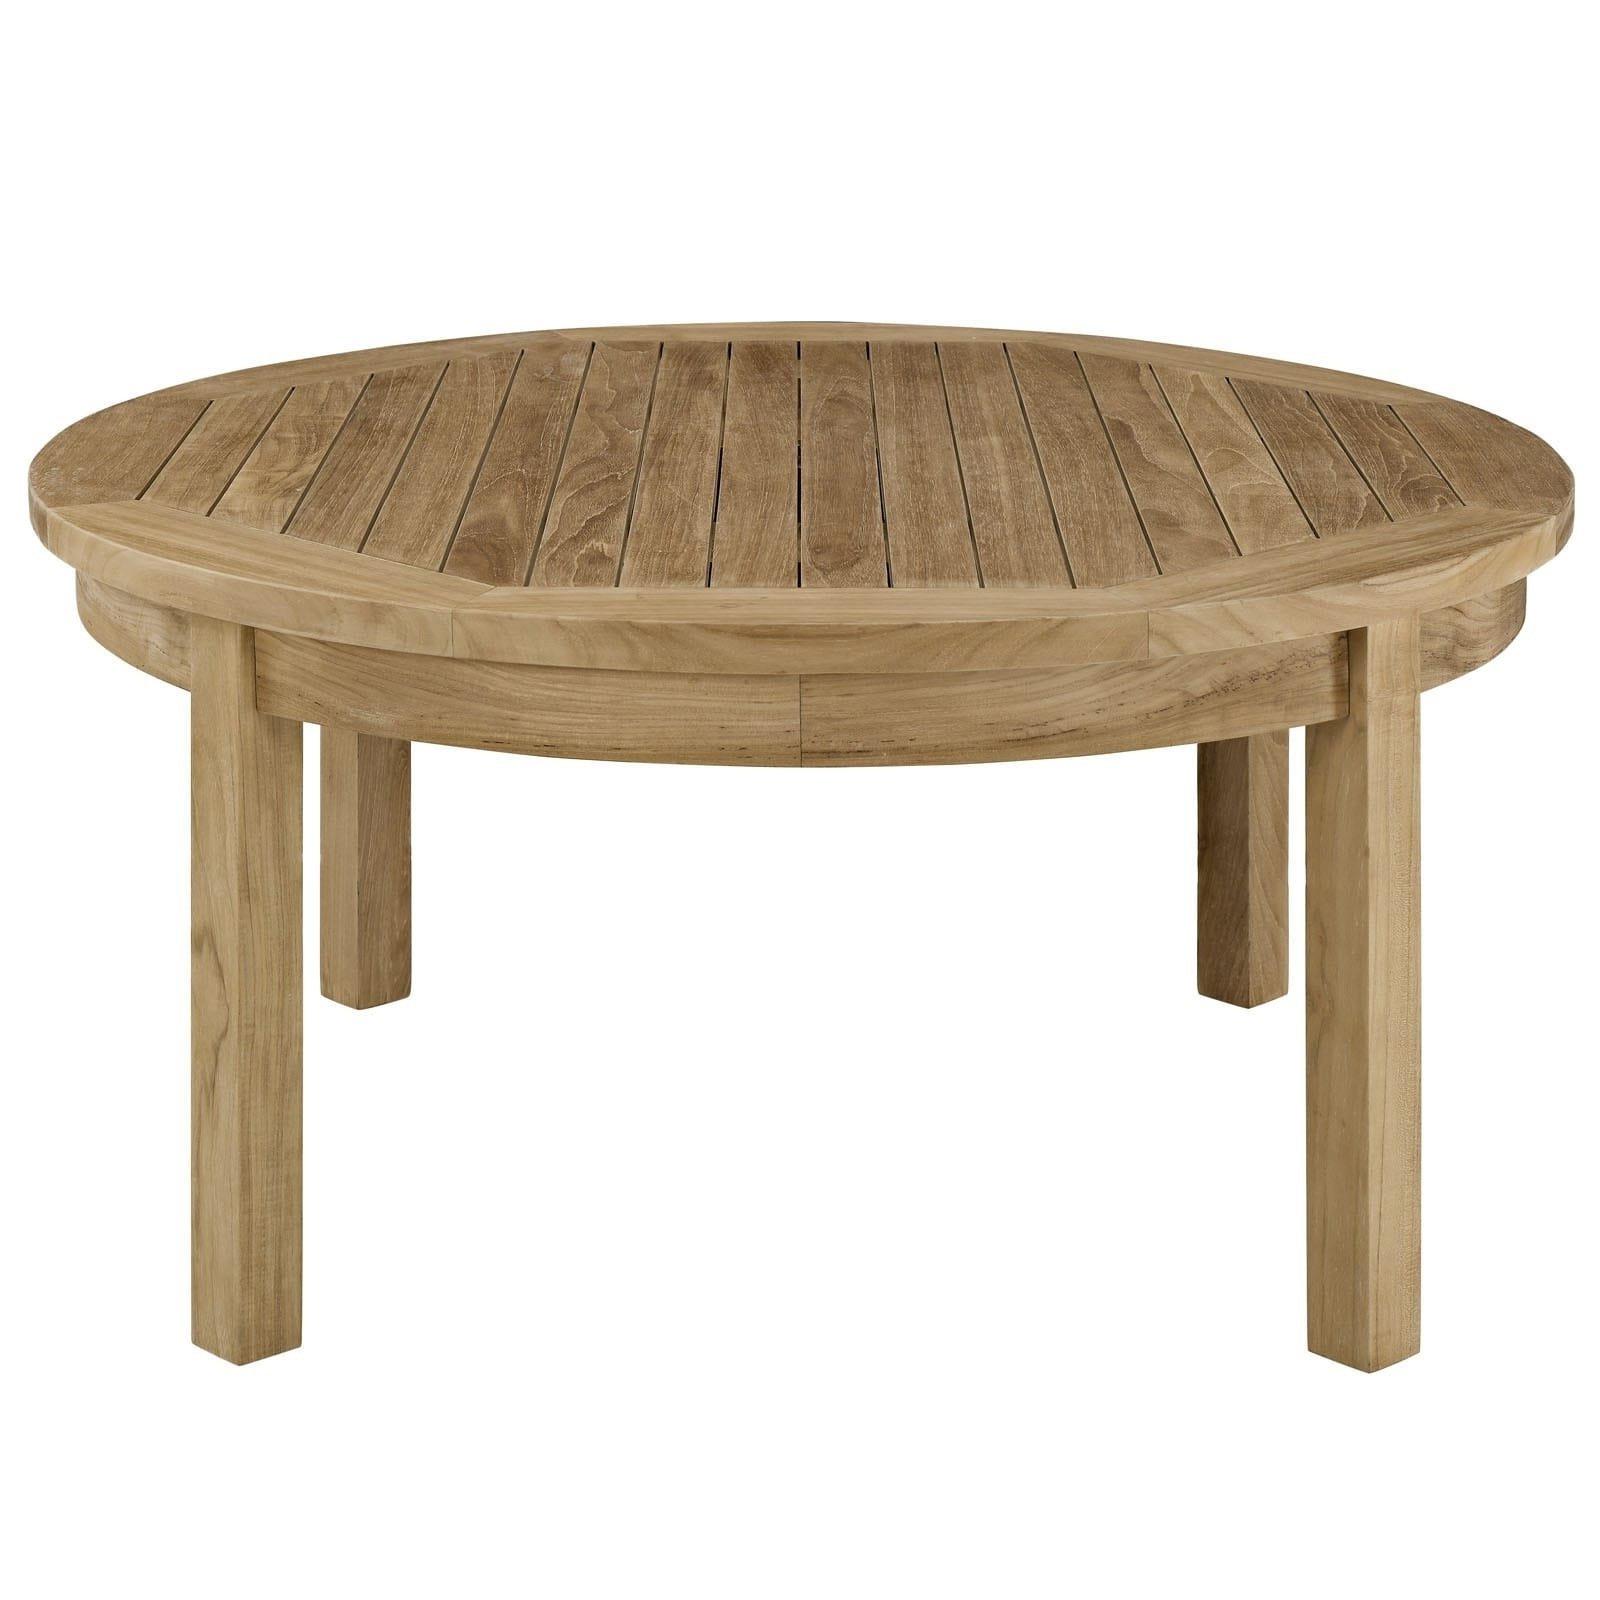 Current Shop Oliver & James Detaille Outdoor Round Teak Coffee Table – On In Round Teak Coffee Tables (Gallery 5 of 20)